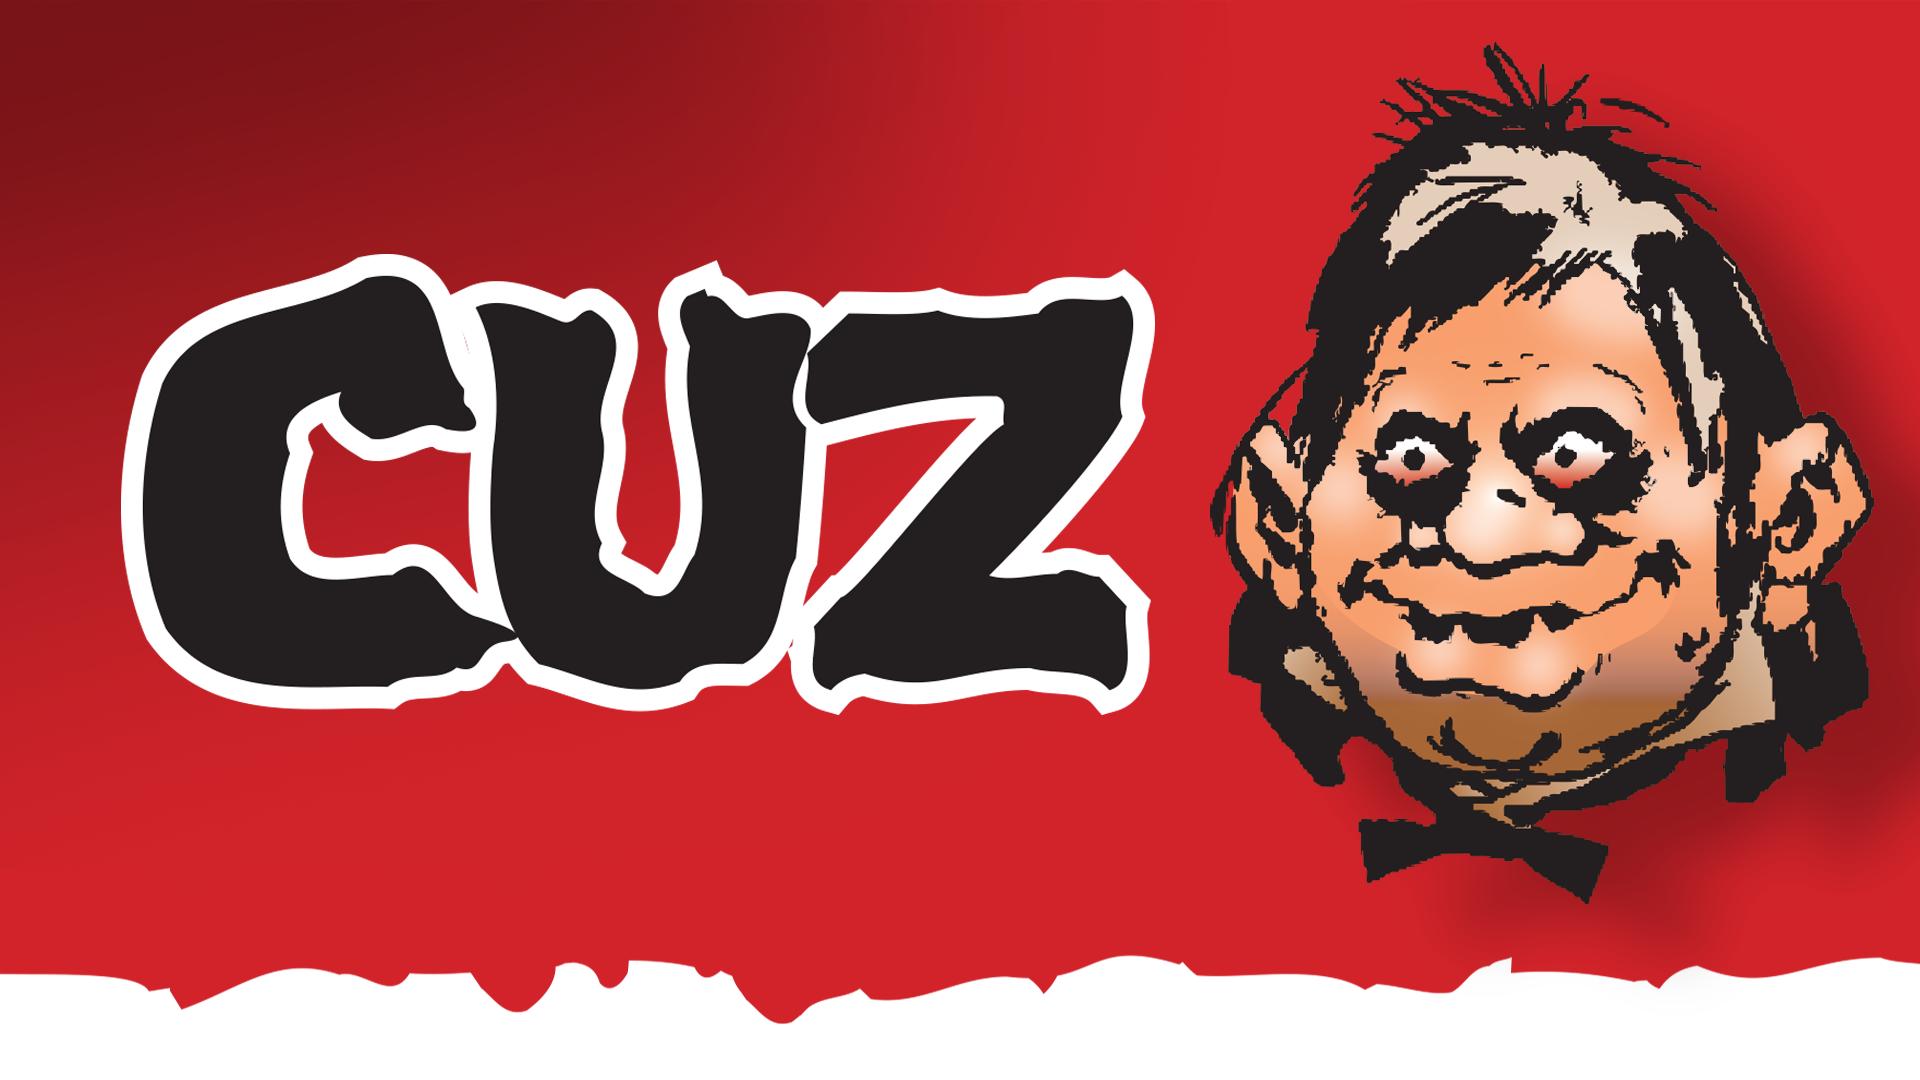 Download Cuz cool free fonts